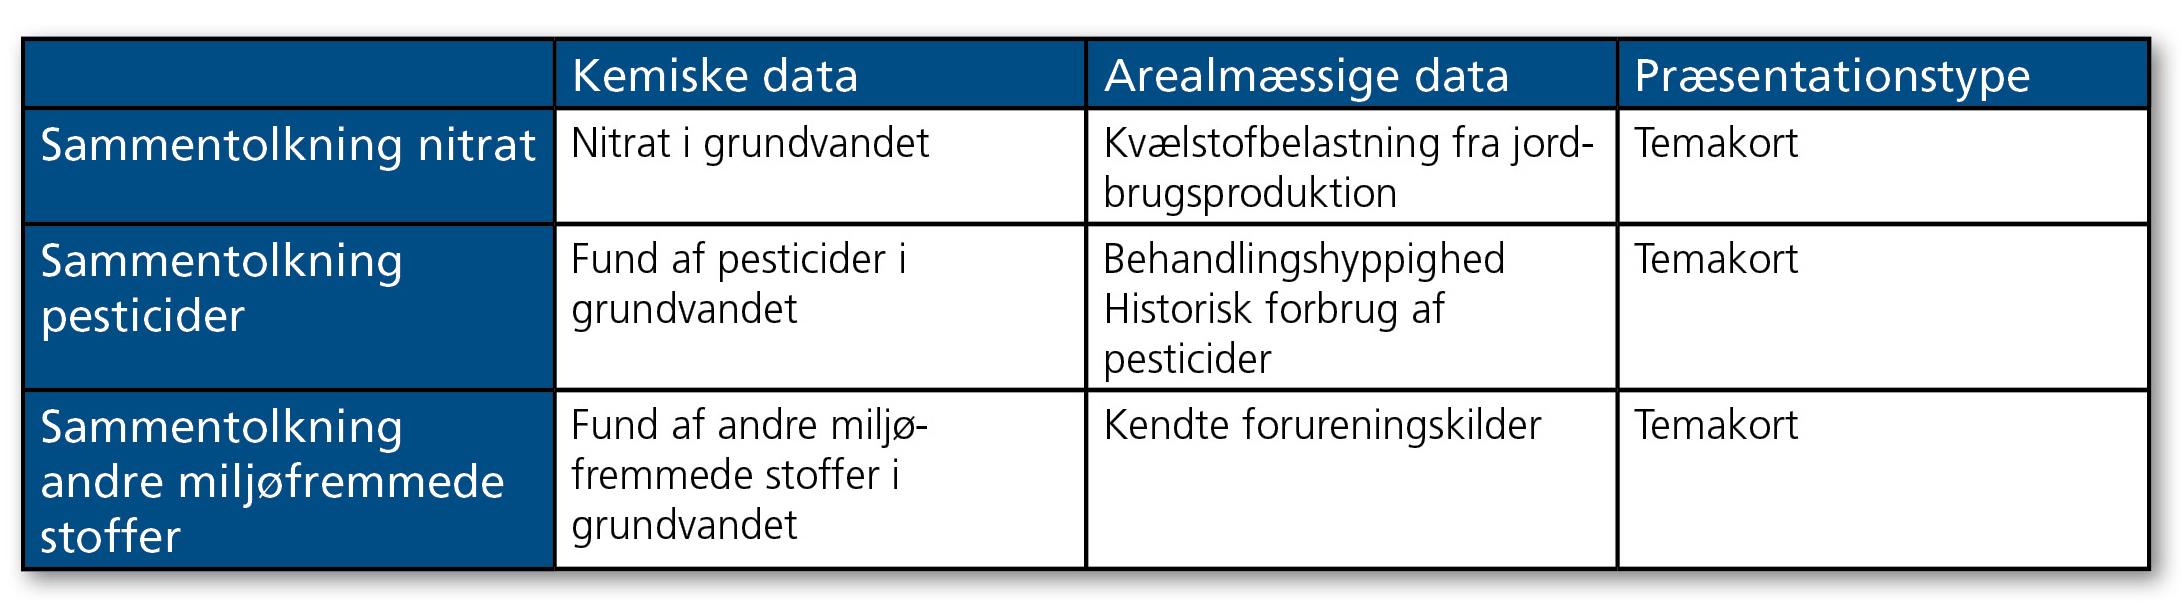 tabel9_1